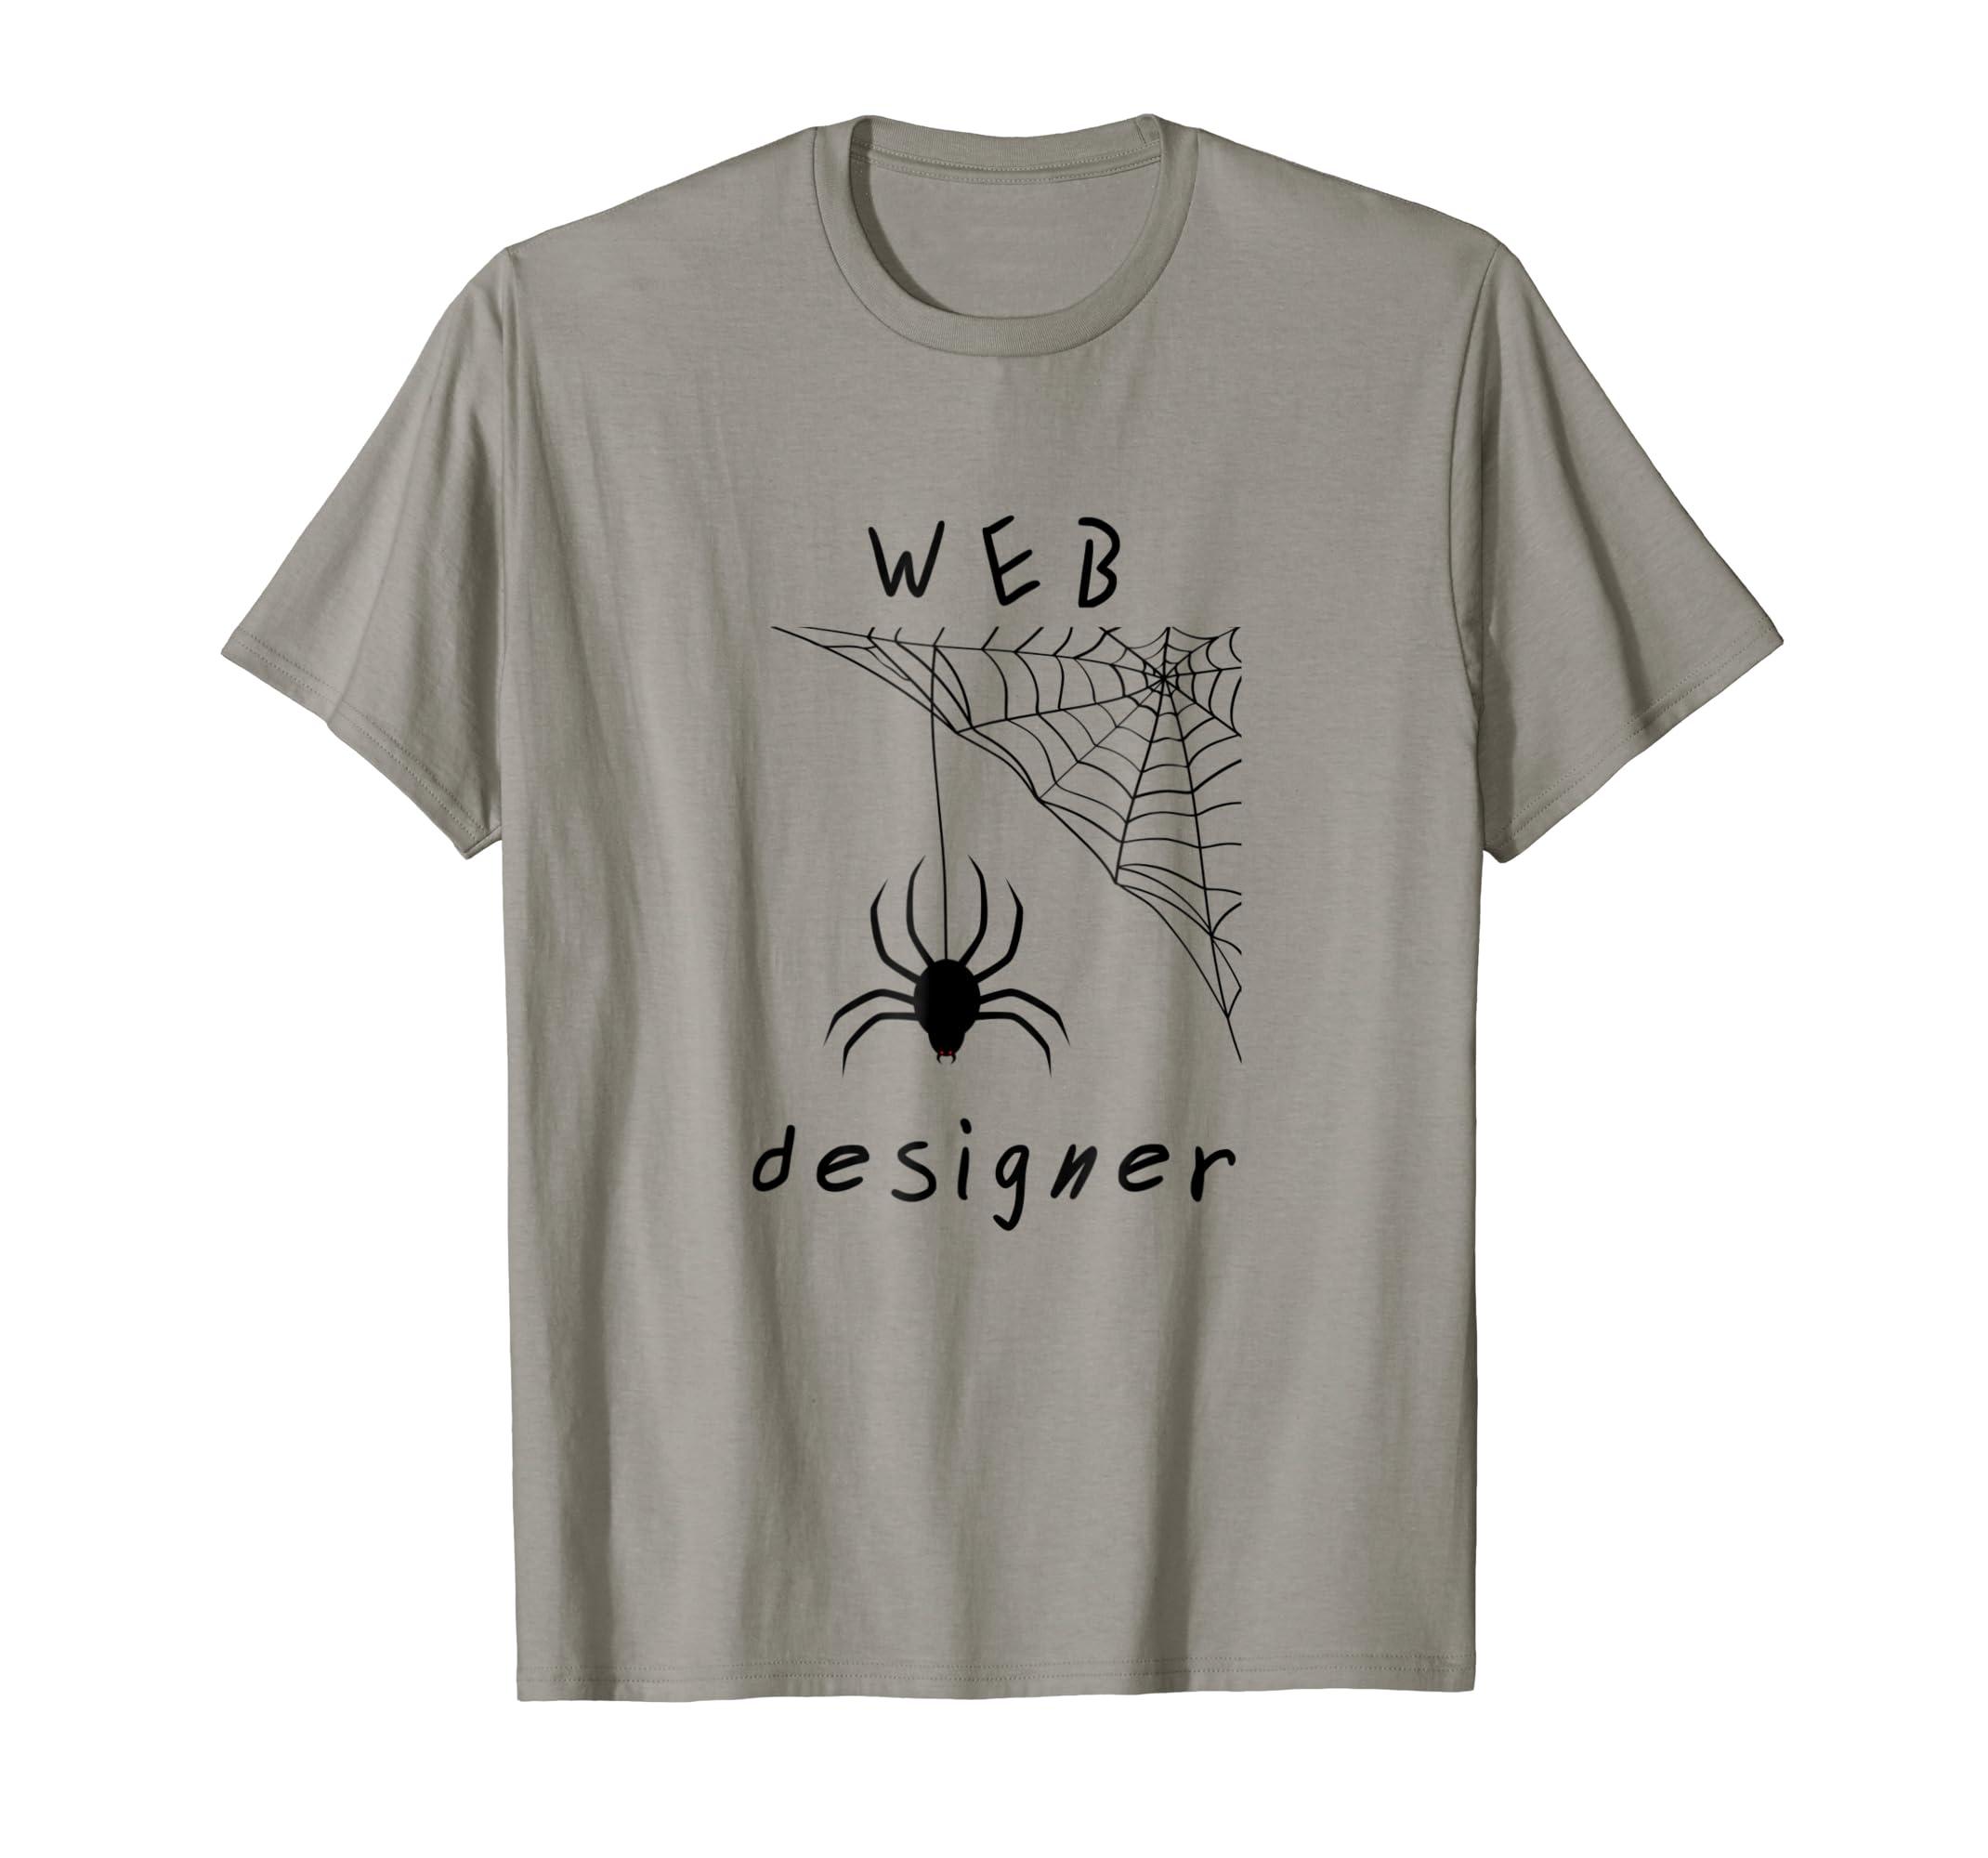 eacbffdd T Shirt Web Design - Cotswold Hire